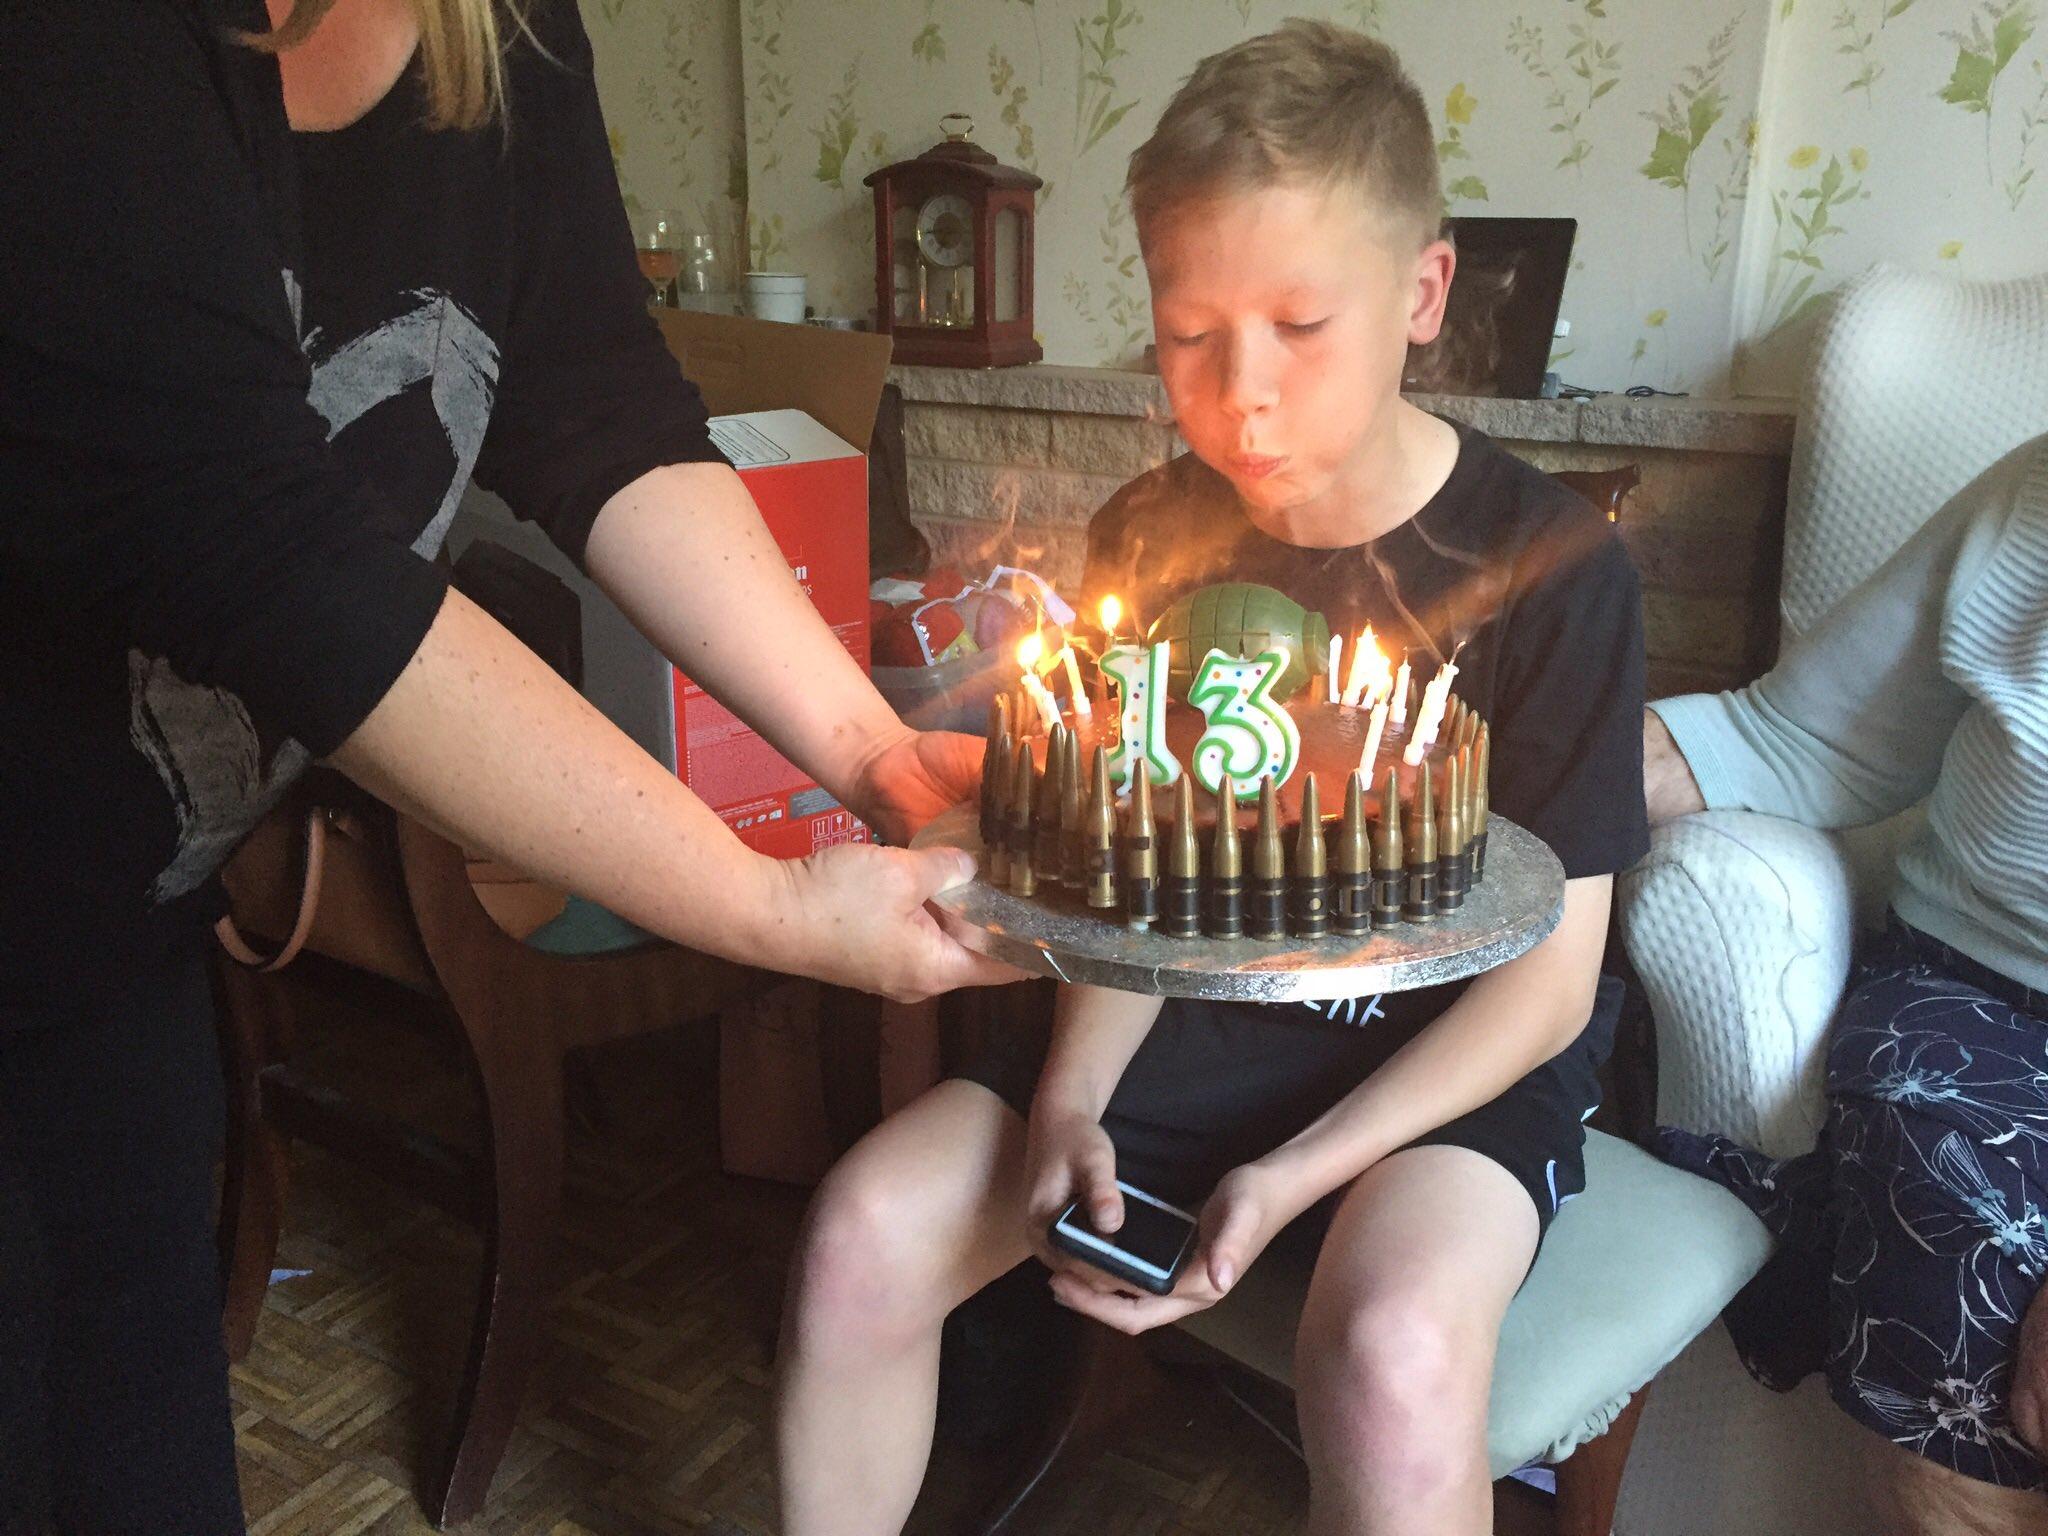 I want my son to have many more birthdays @VertexPharma #OrkambiNow https://t.co/9uhGMvlm7z